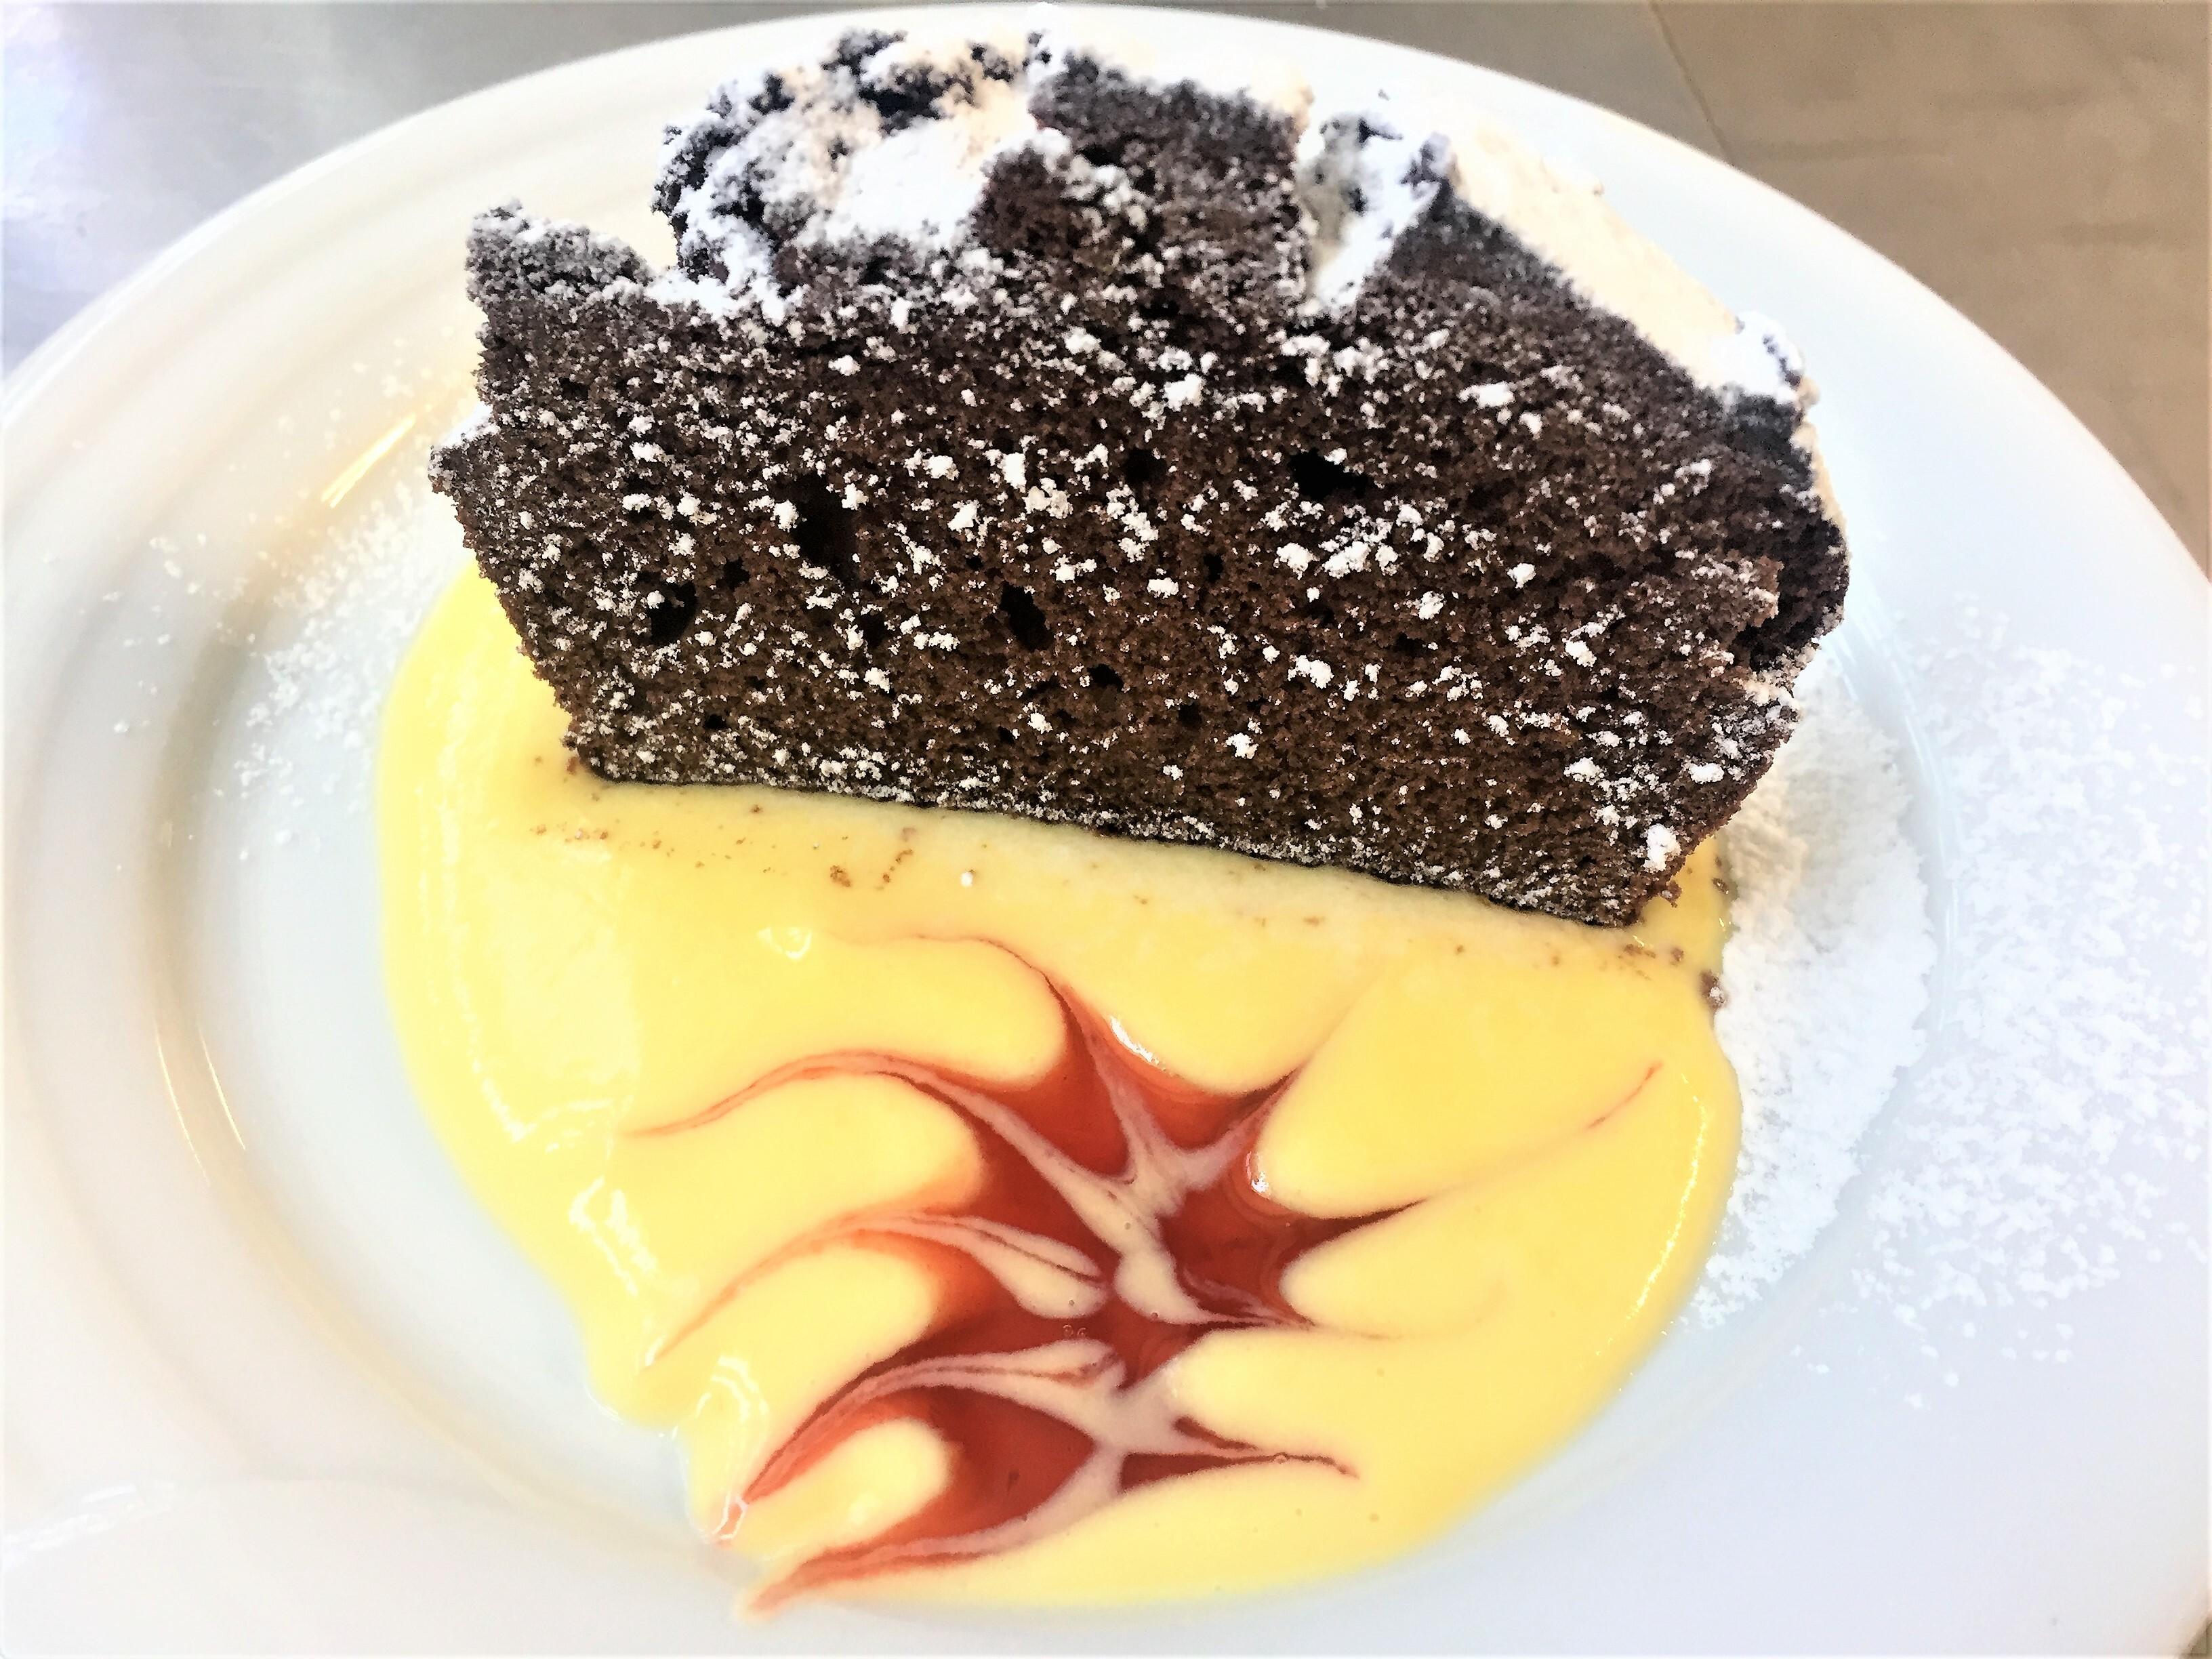 Trancio-al-cioccolato-con-crema